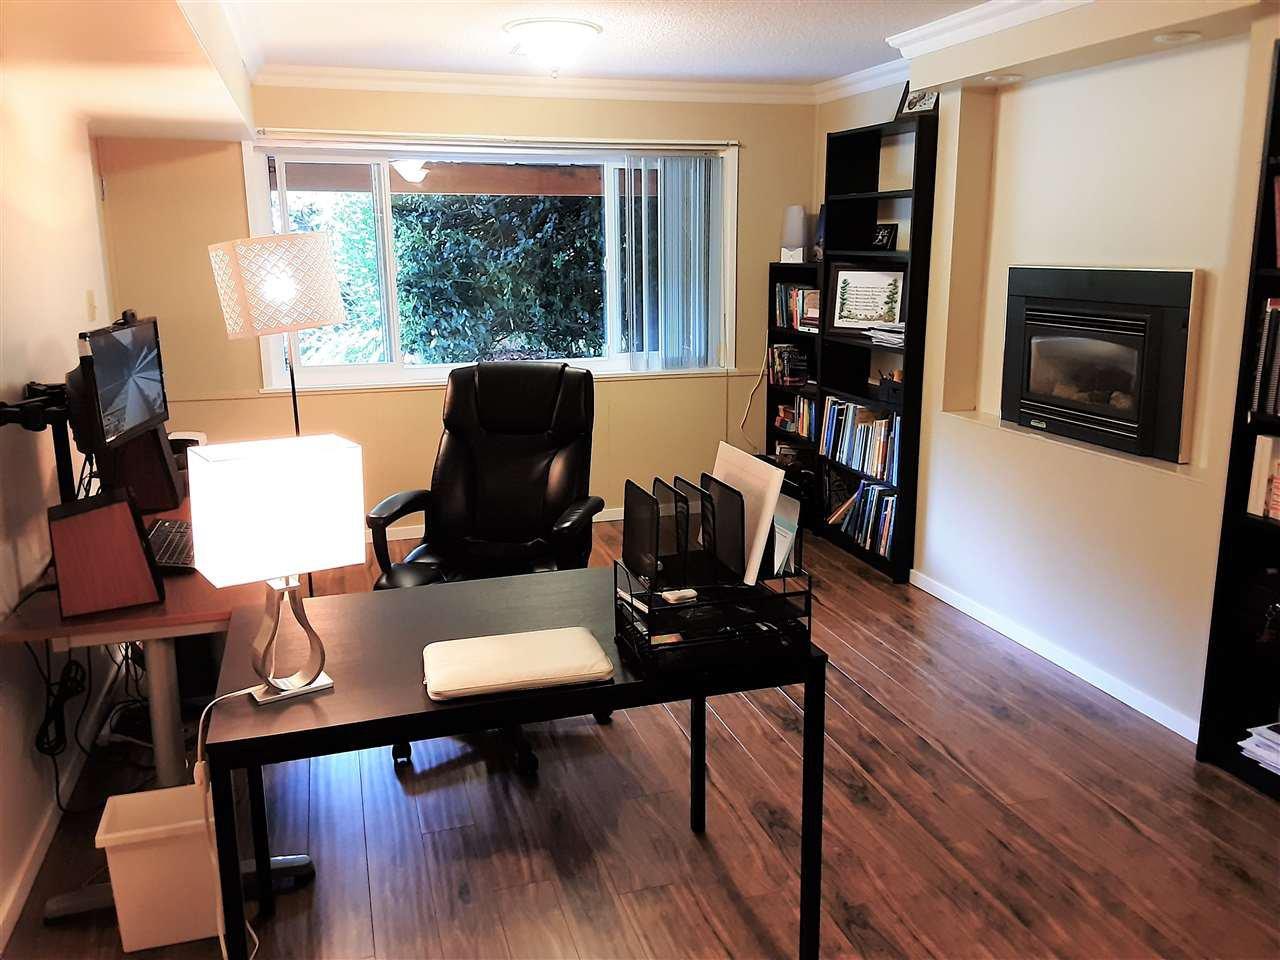 Photo 23: Photos: 15291 COLUMBIA Avenue: White Rock House for sale (South Surrey White Rock)  : MLS®# R2492863